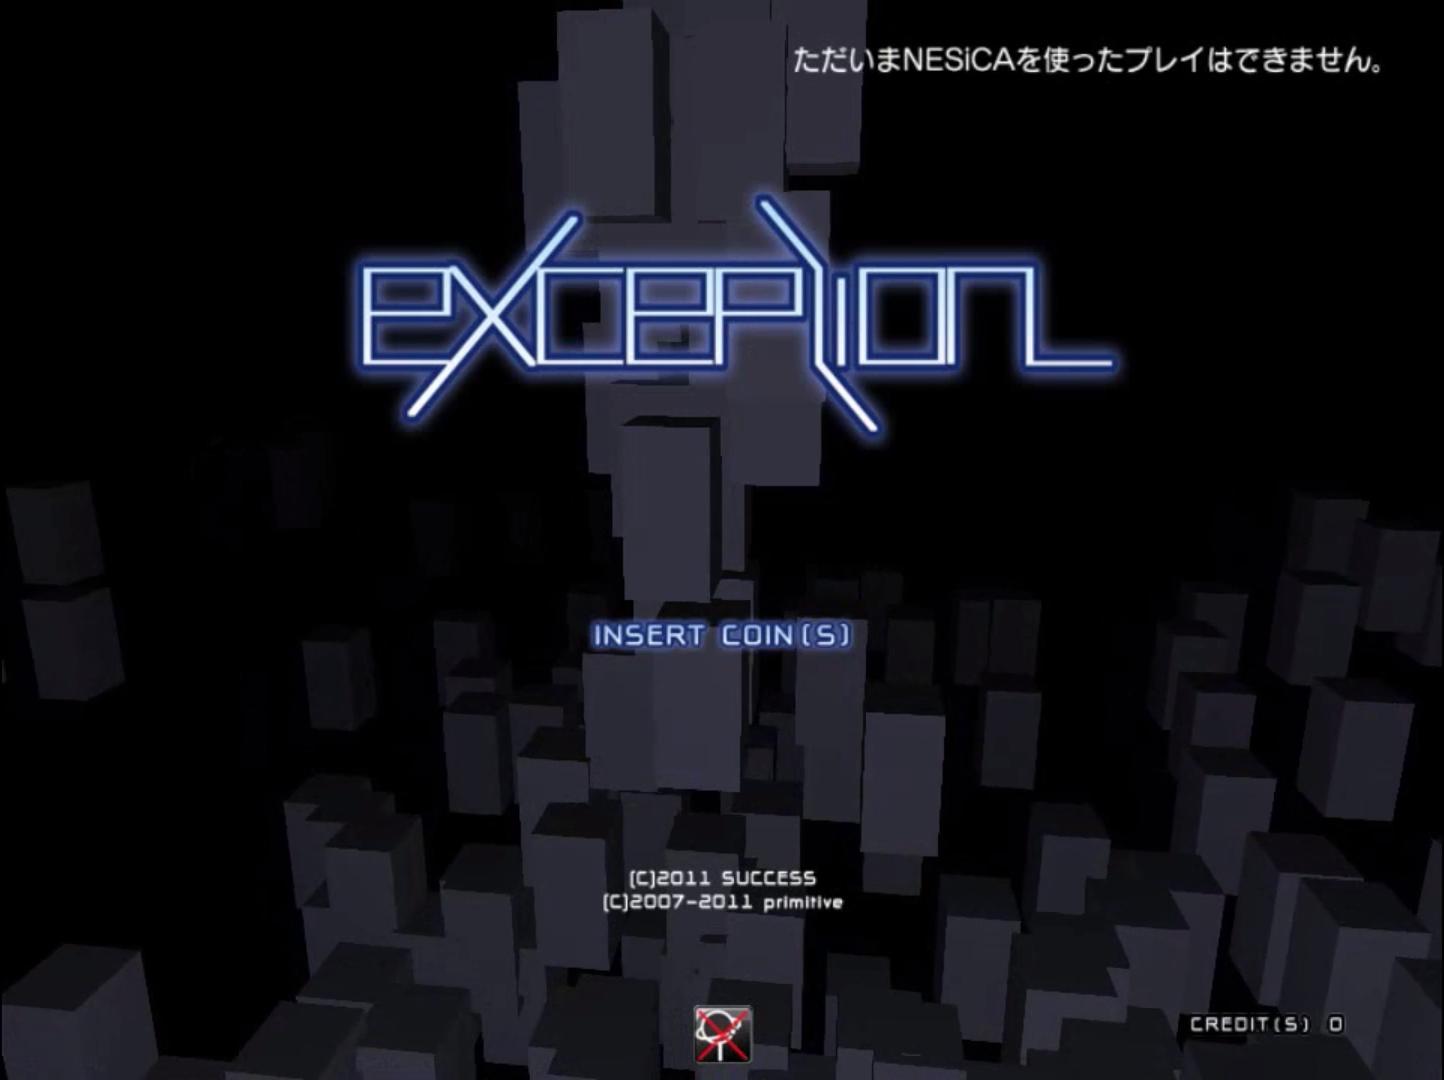 Exception Arcade Dump